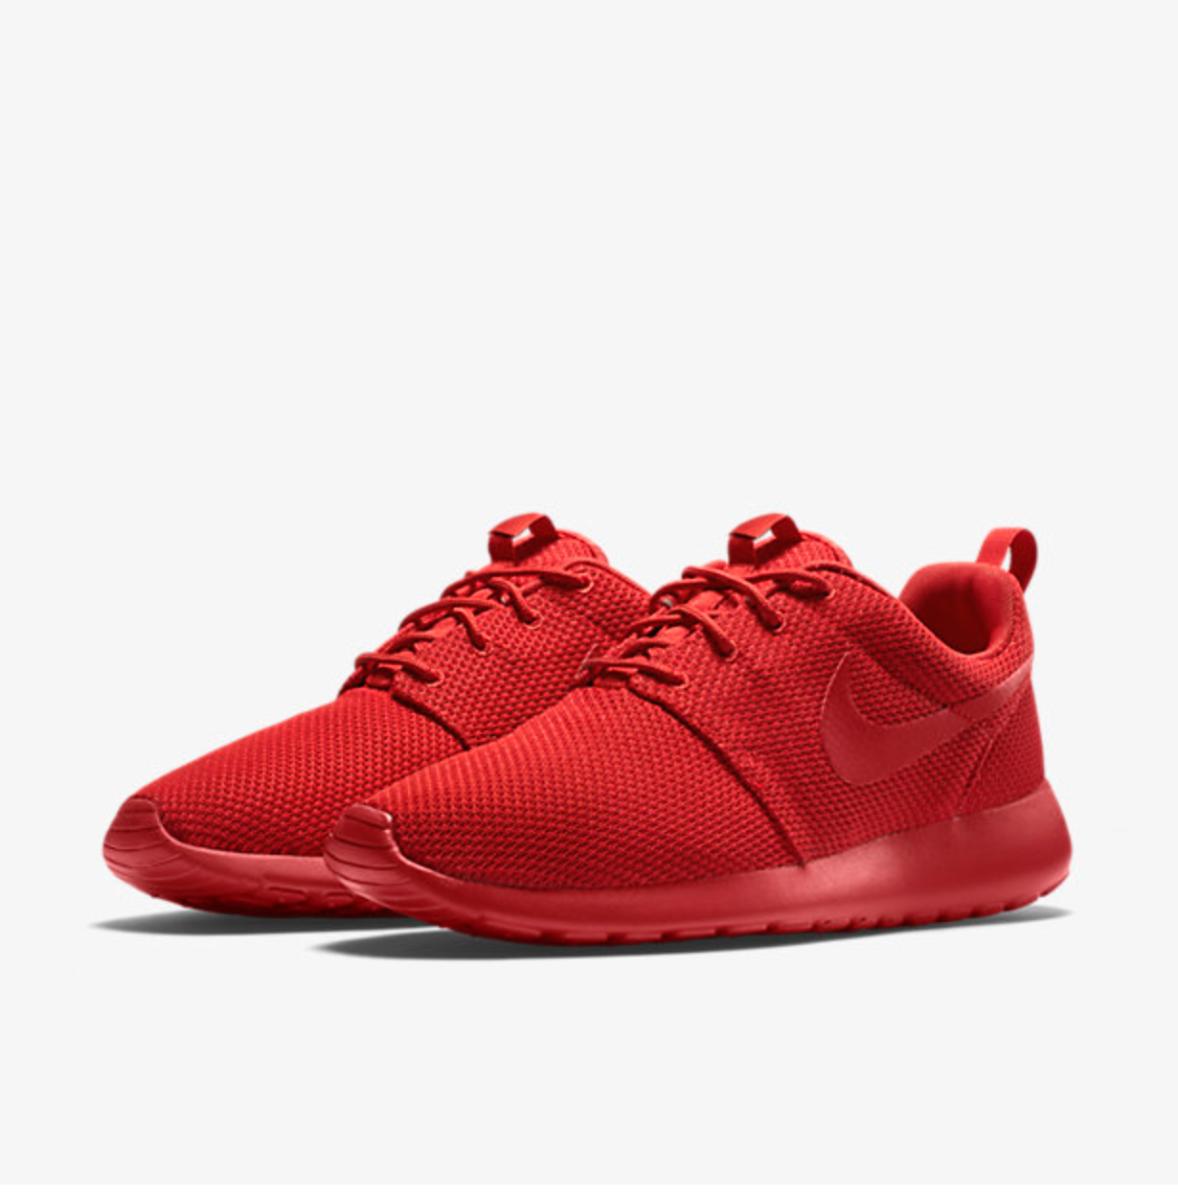 Nike Roshe One �C Red Out   I AM JVSTVS